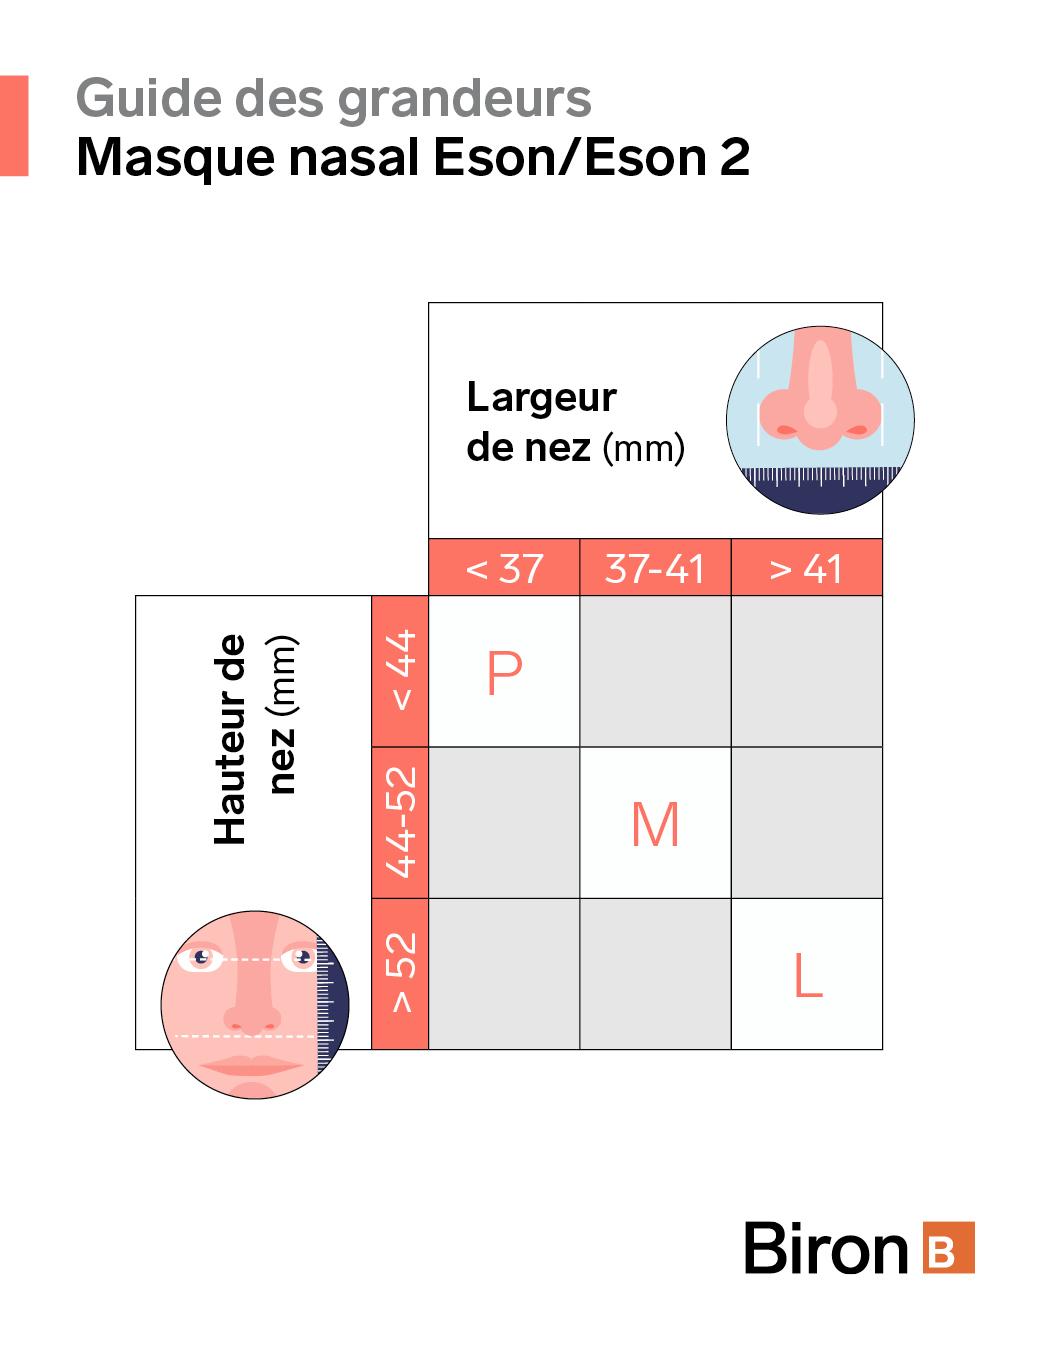 Gabarit grandeur Masque nasal Eson 2